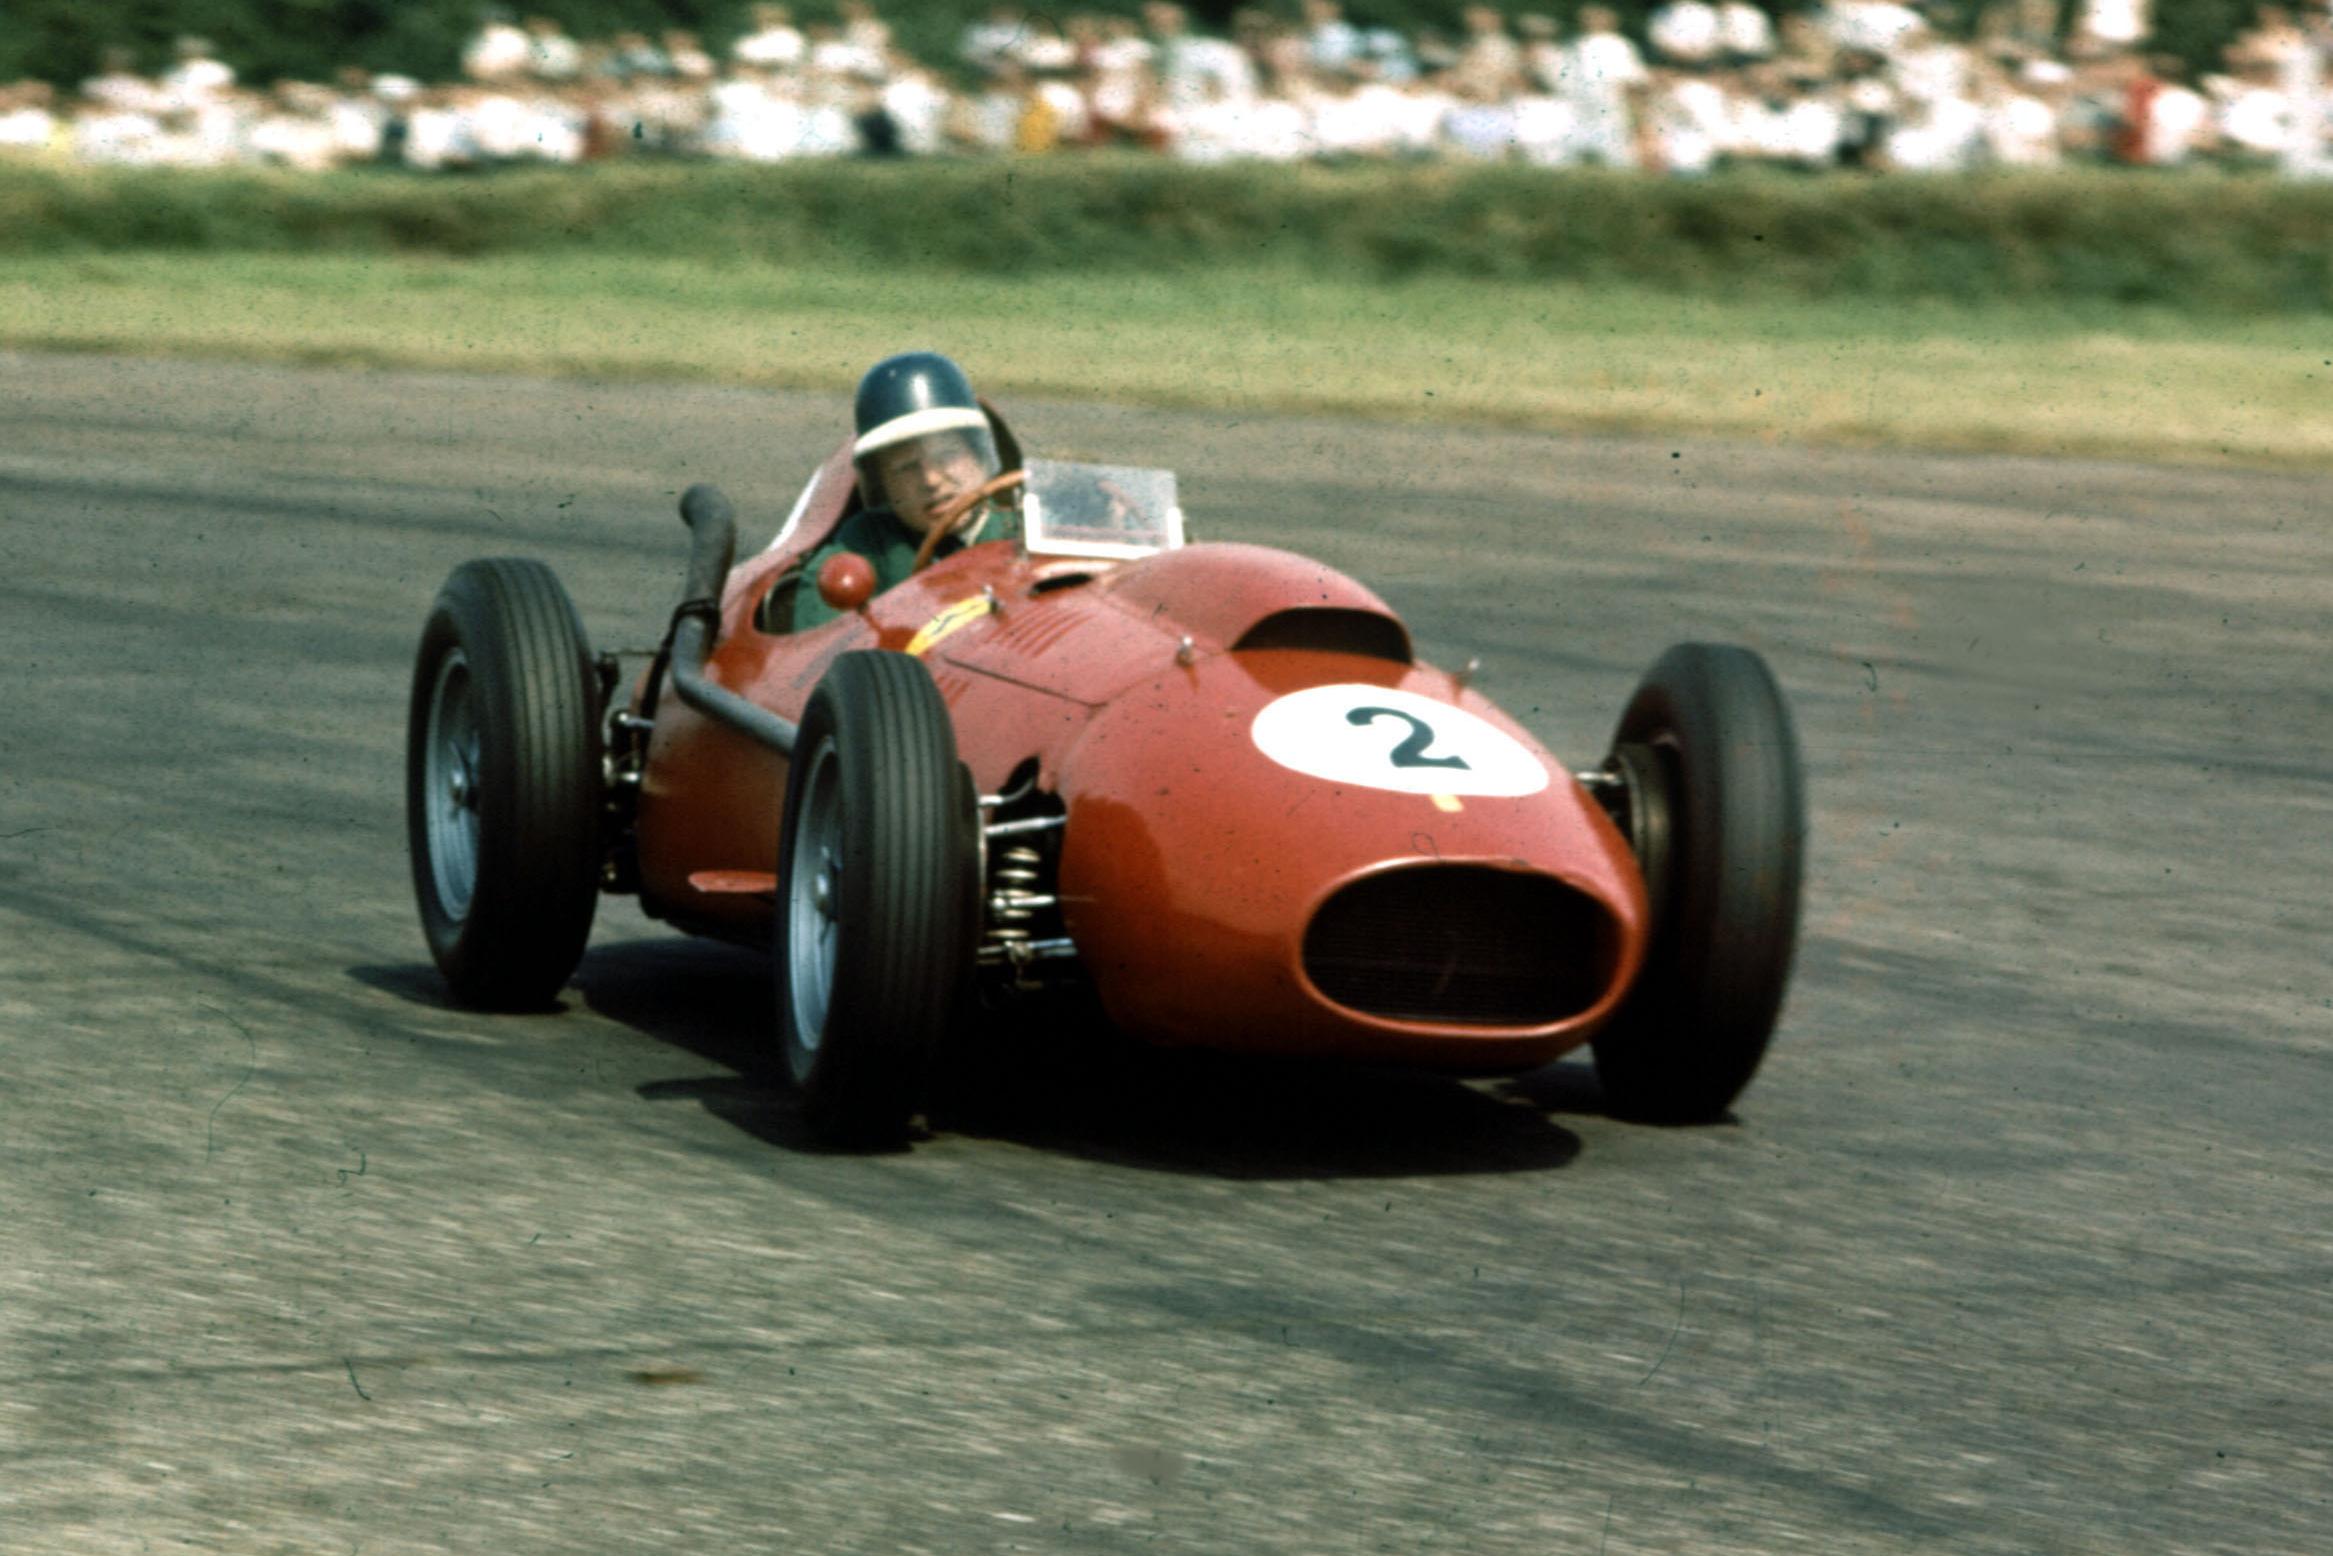 Mike Hawthorn in a Ferrari Dino 246